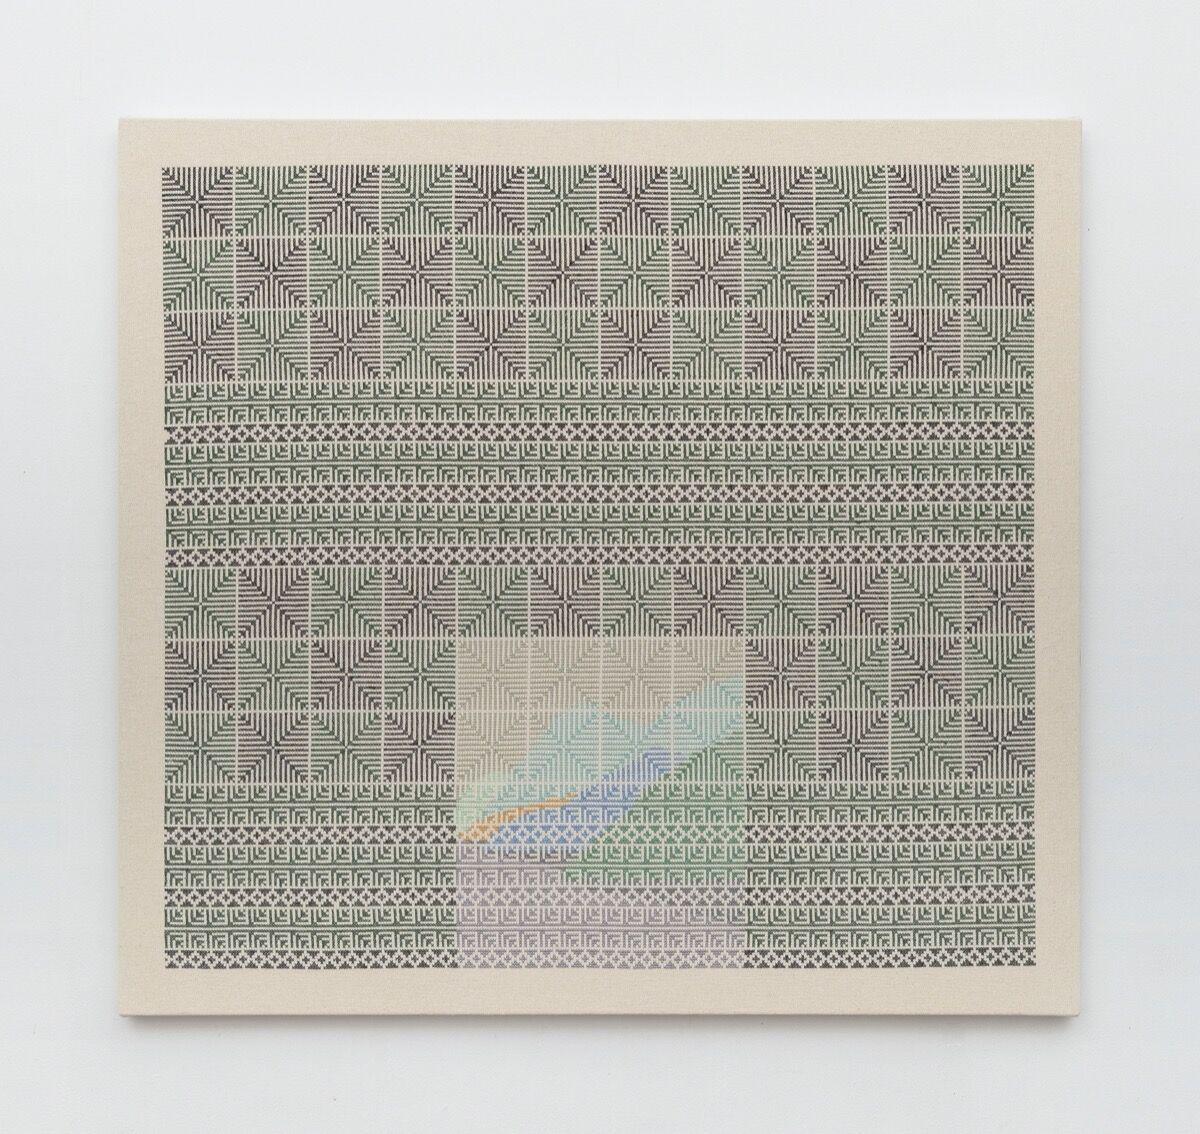 Jordan Nassar, Memories, 2018. Courtesy of the artist, Anat Ebgi, and James Cohan, New York.